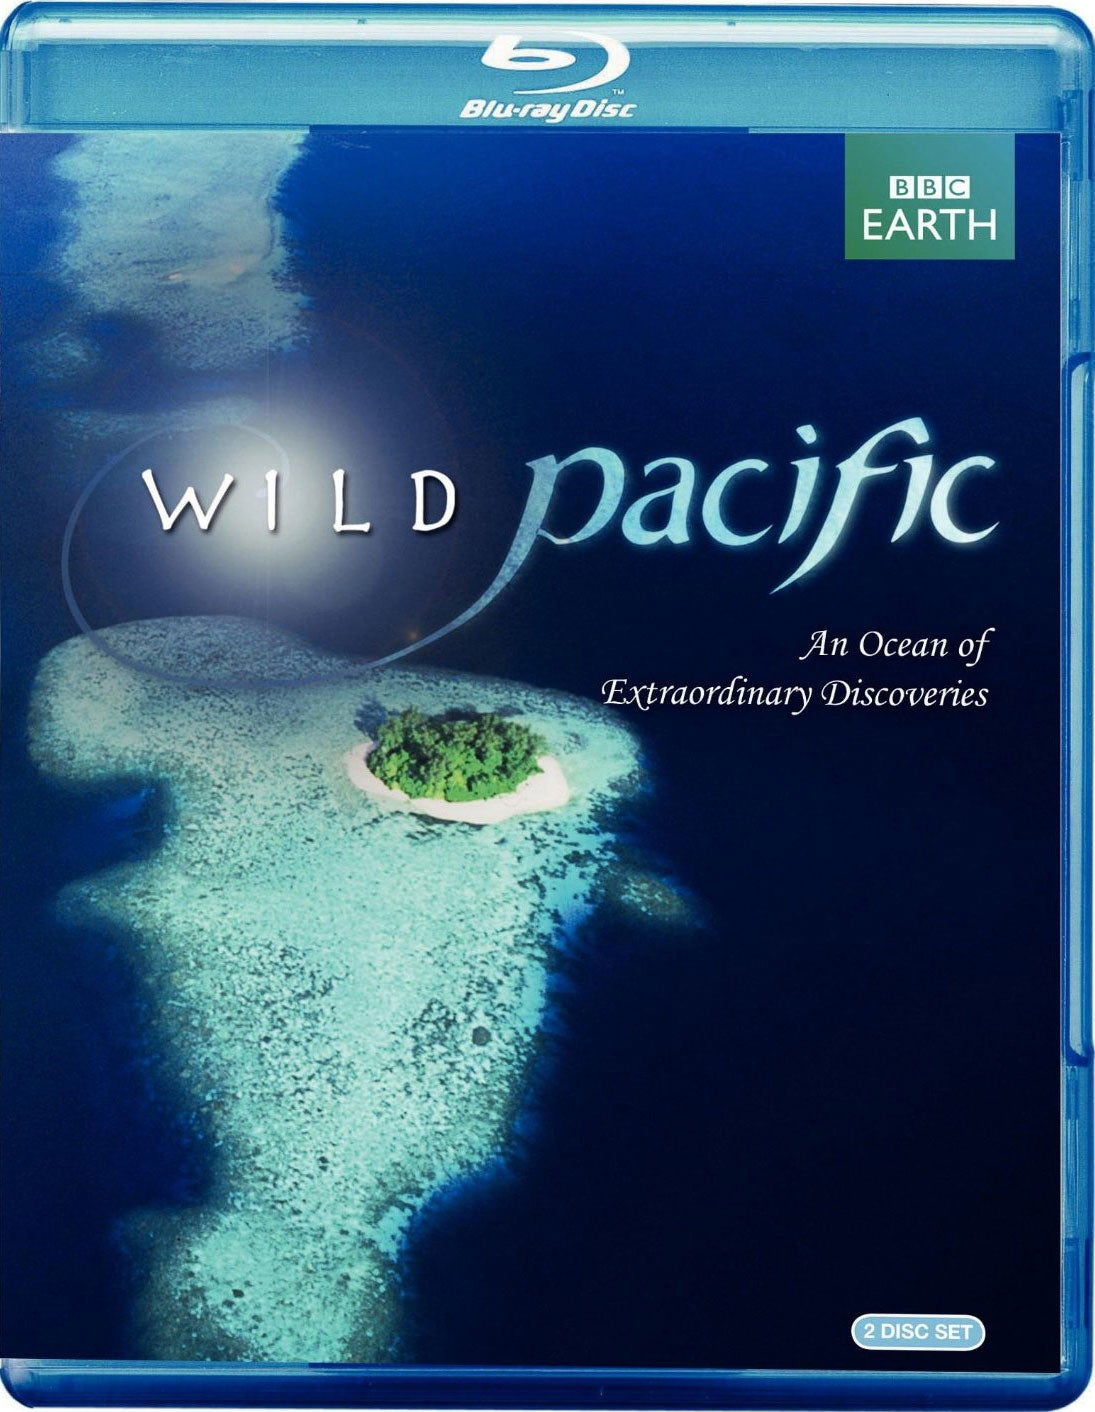 Wild Pacific (Blu-ray Disc)